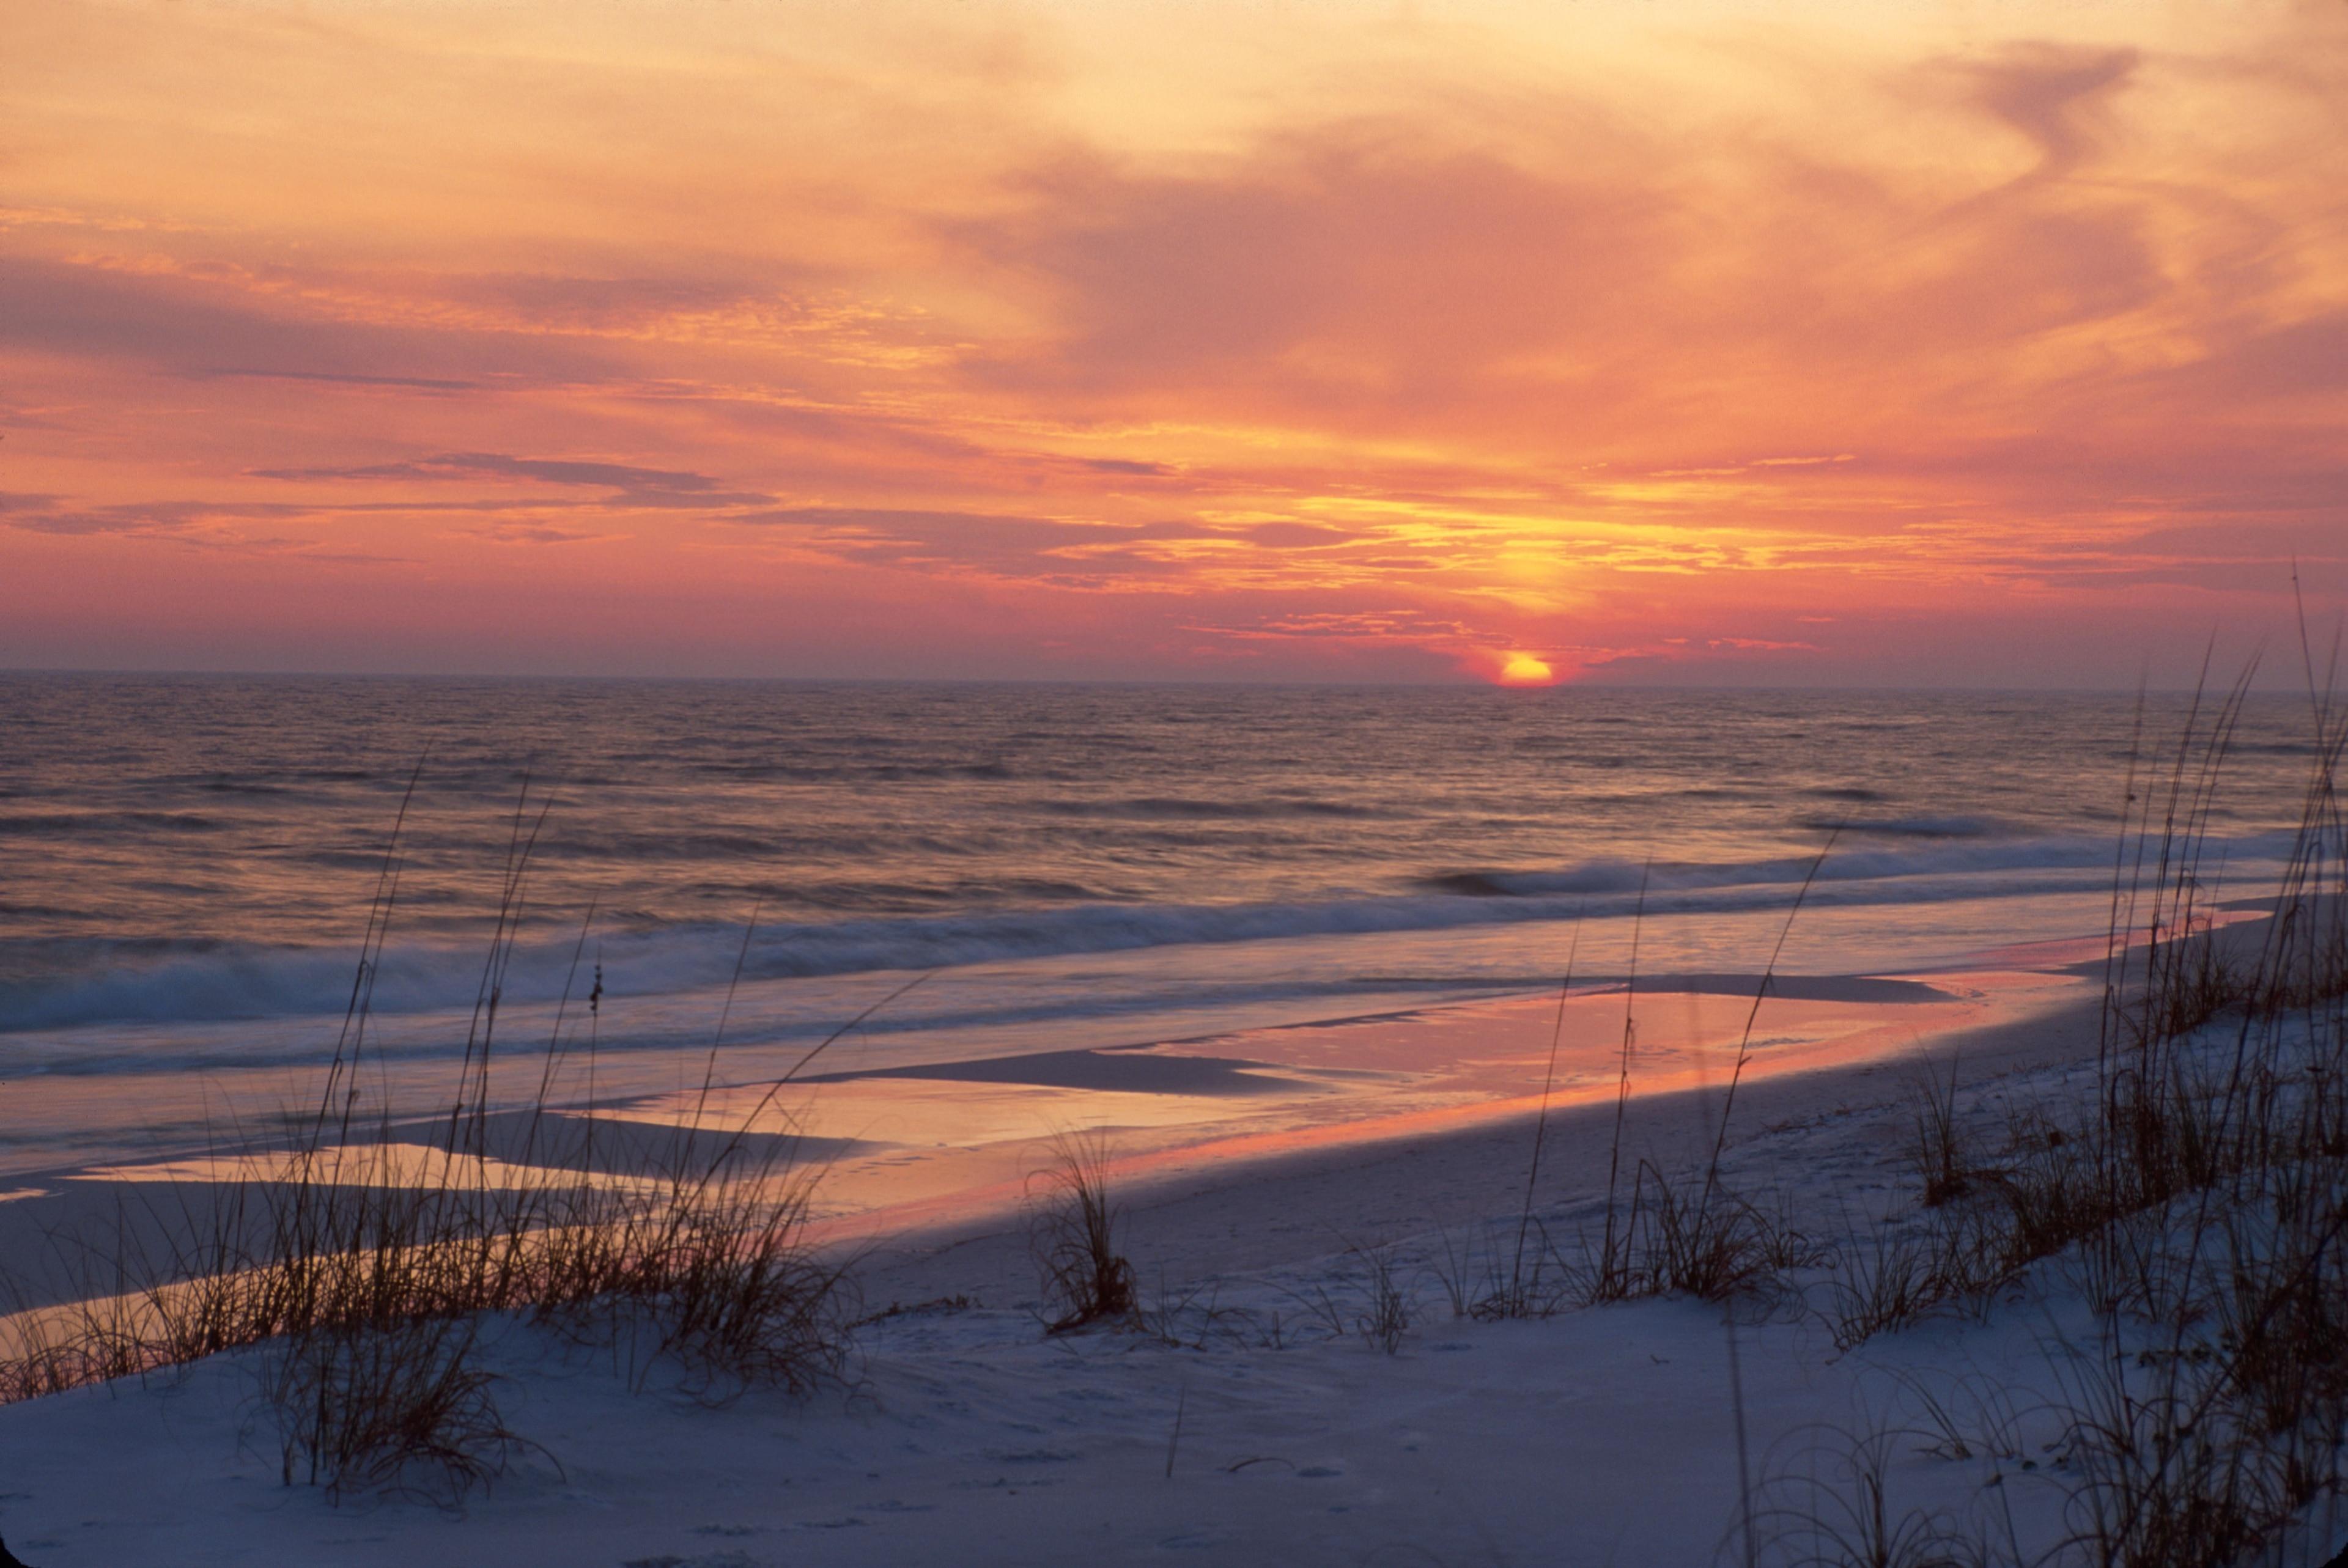 Topsail Beach State Preserve, Santa Rosa Beach, Florida, Verenigde Staten